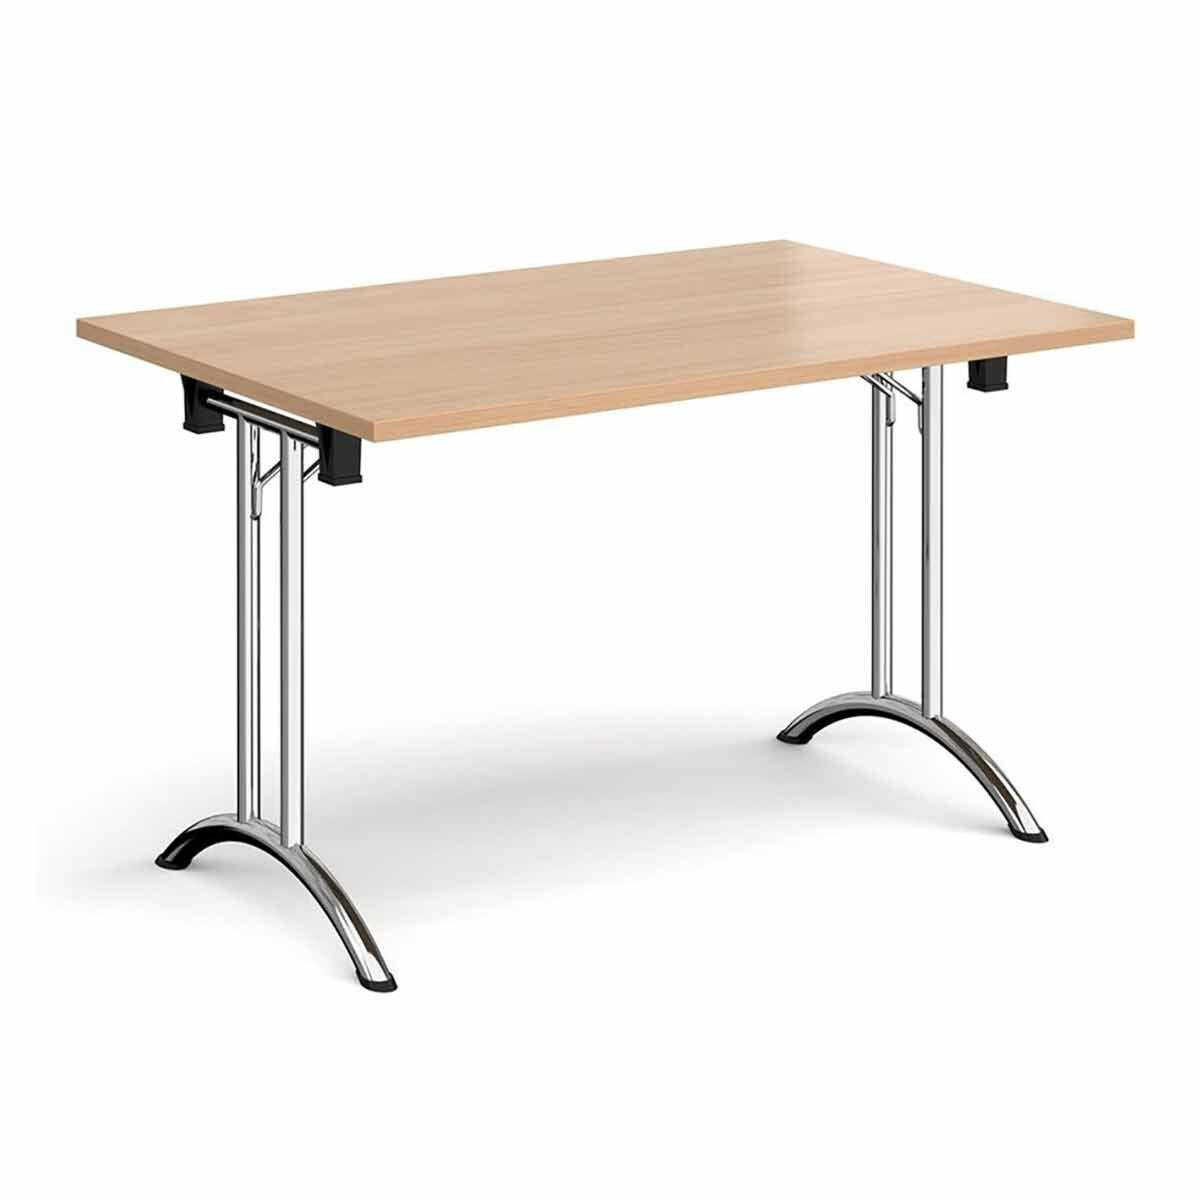 Tabilo Folding Table with Curved Chrome Frame 1400 x 800mm Beech